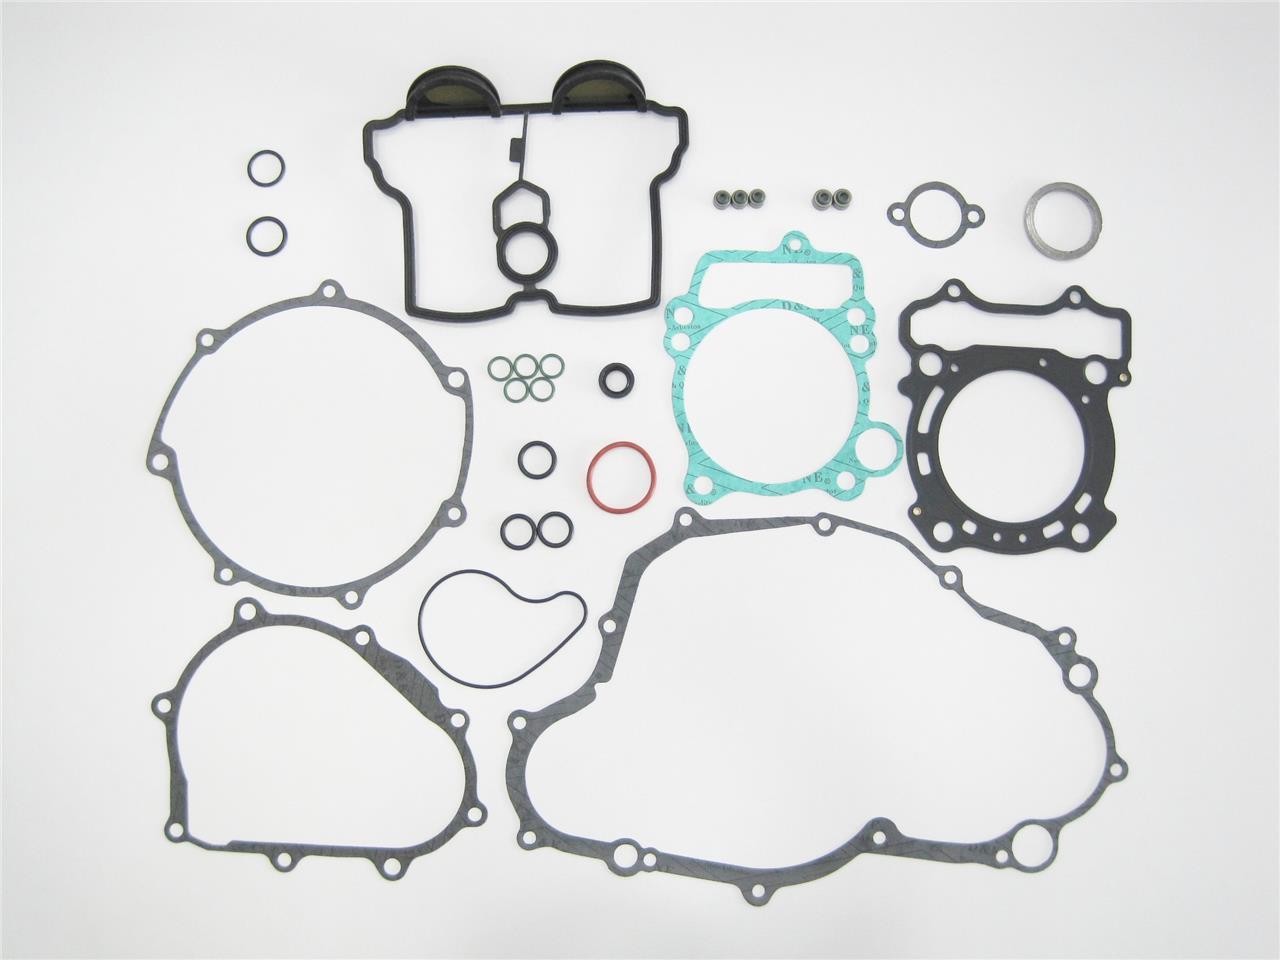 Motorcycle Parts Accessories From Japan Webike Royal Enfield Bullet 500 Wiring Diagram Tecnium Complete Engine Gasket Set